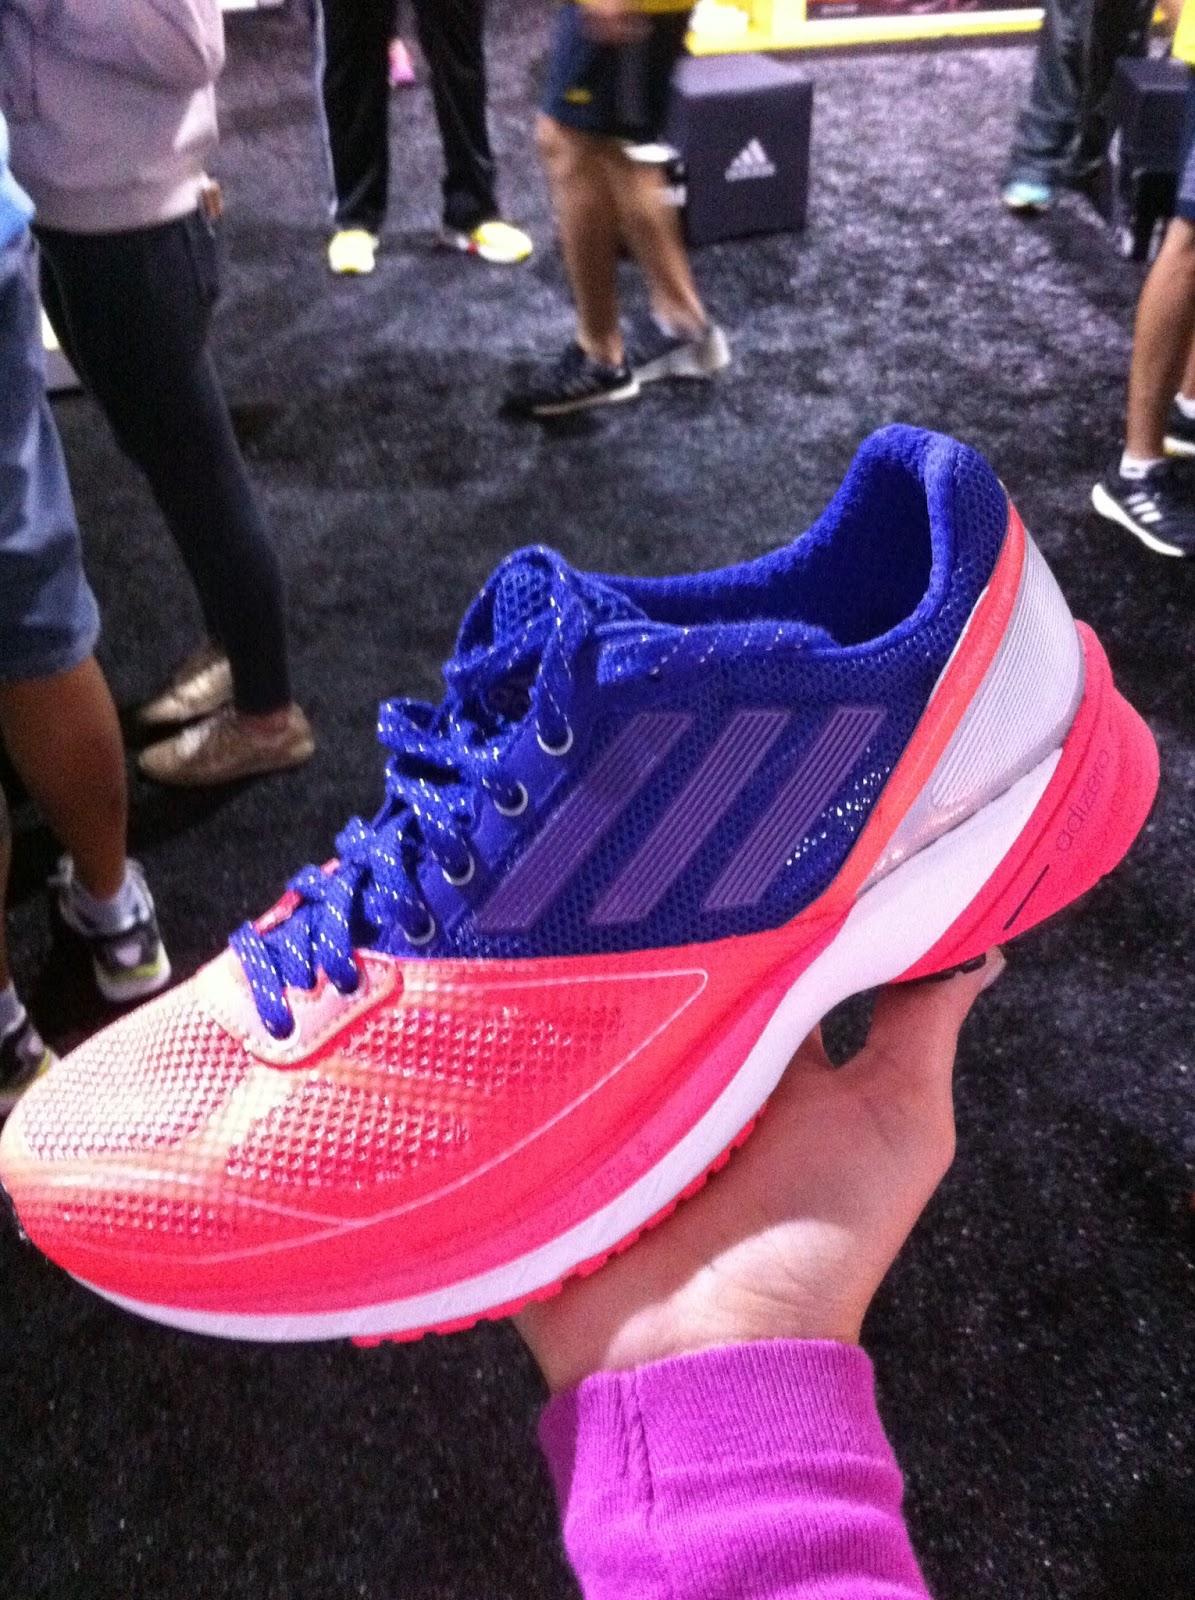 7fc25febde Let´s Run - Correndo na Viagem  18.08.2013 - Meia Maratona ...